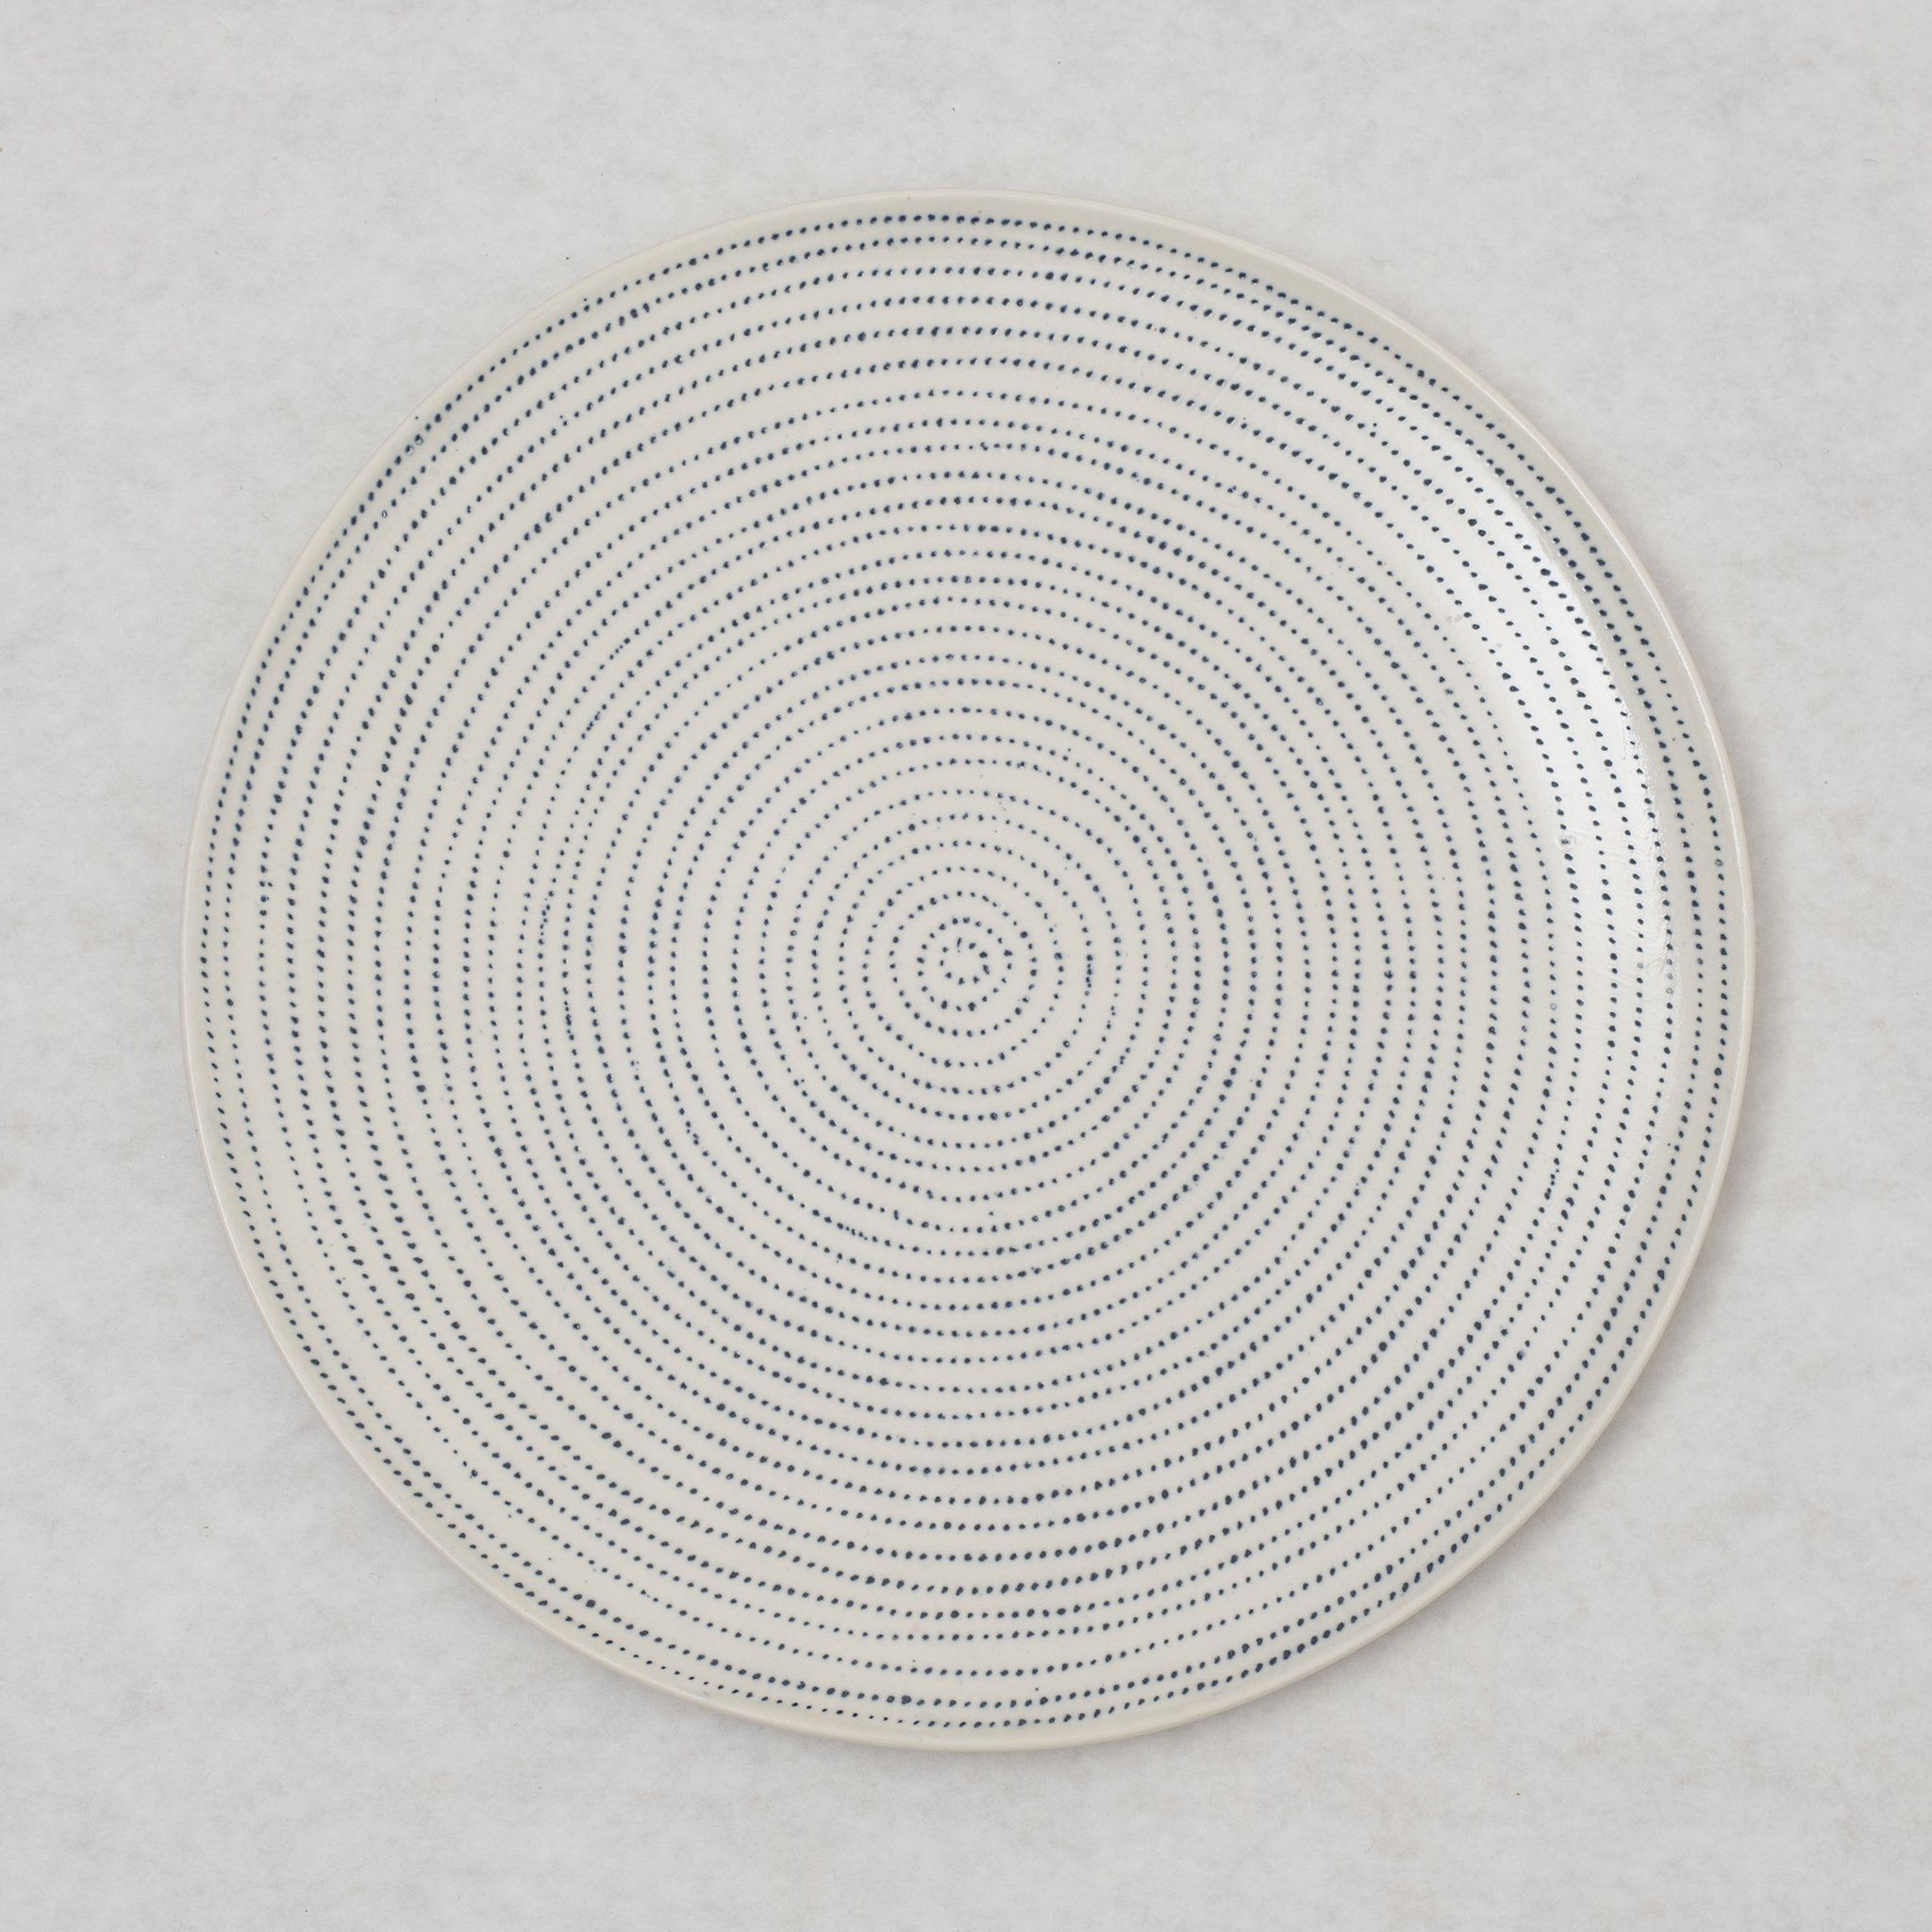 Harare Serving Platter Medium 12 In 2020 Serving Platters Traditional Baskets Ceramics